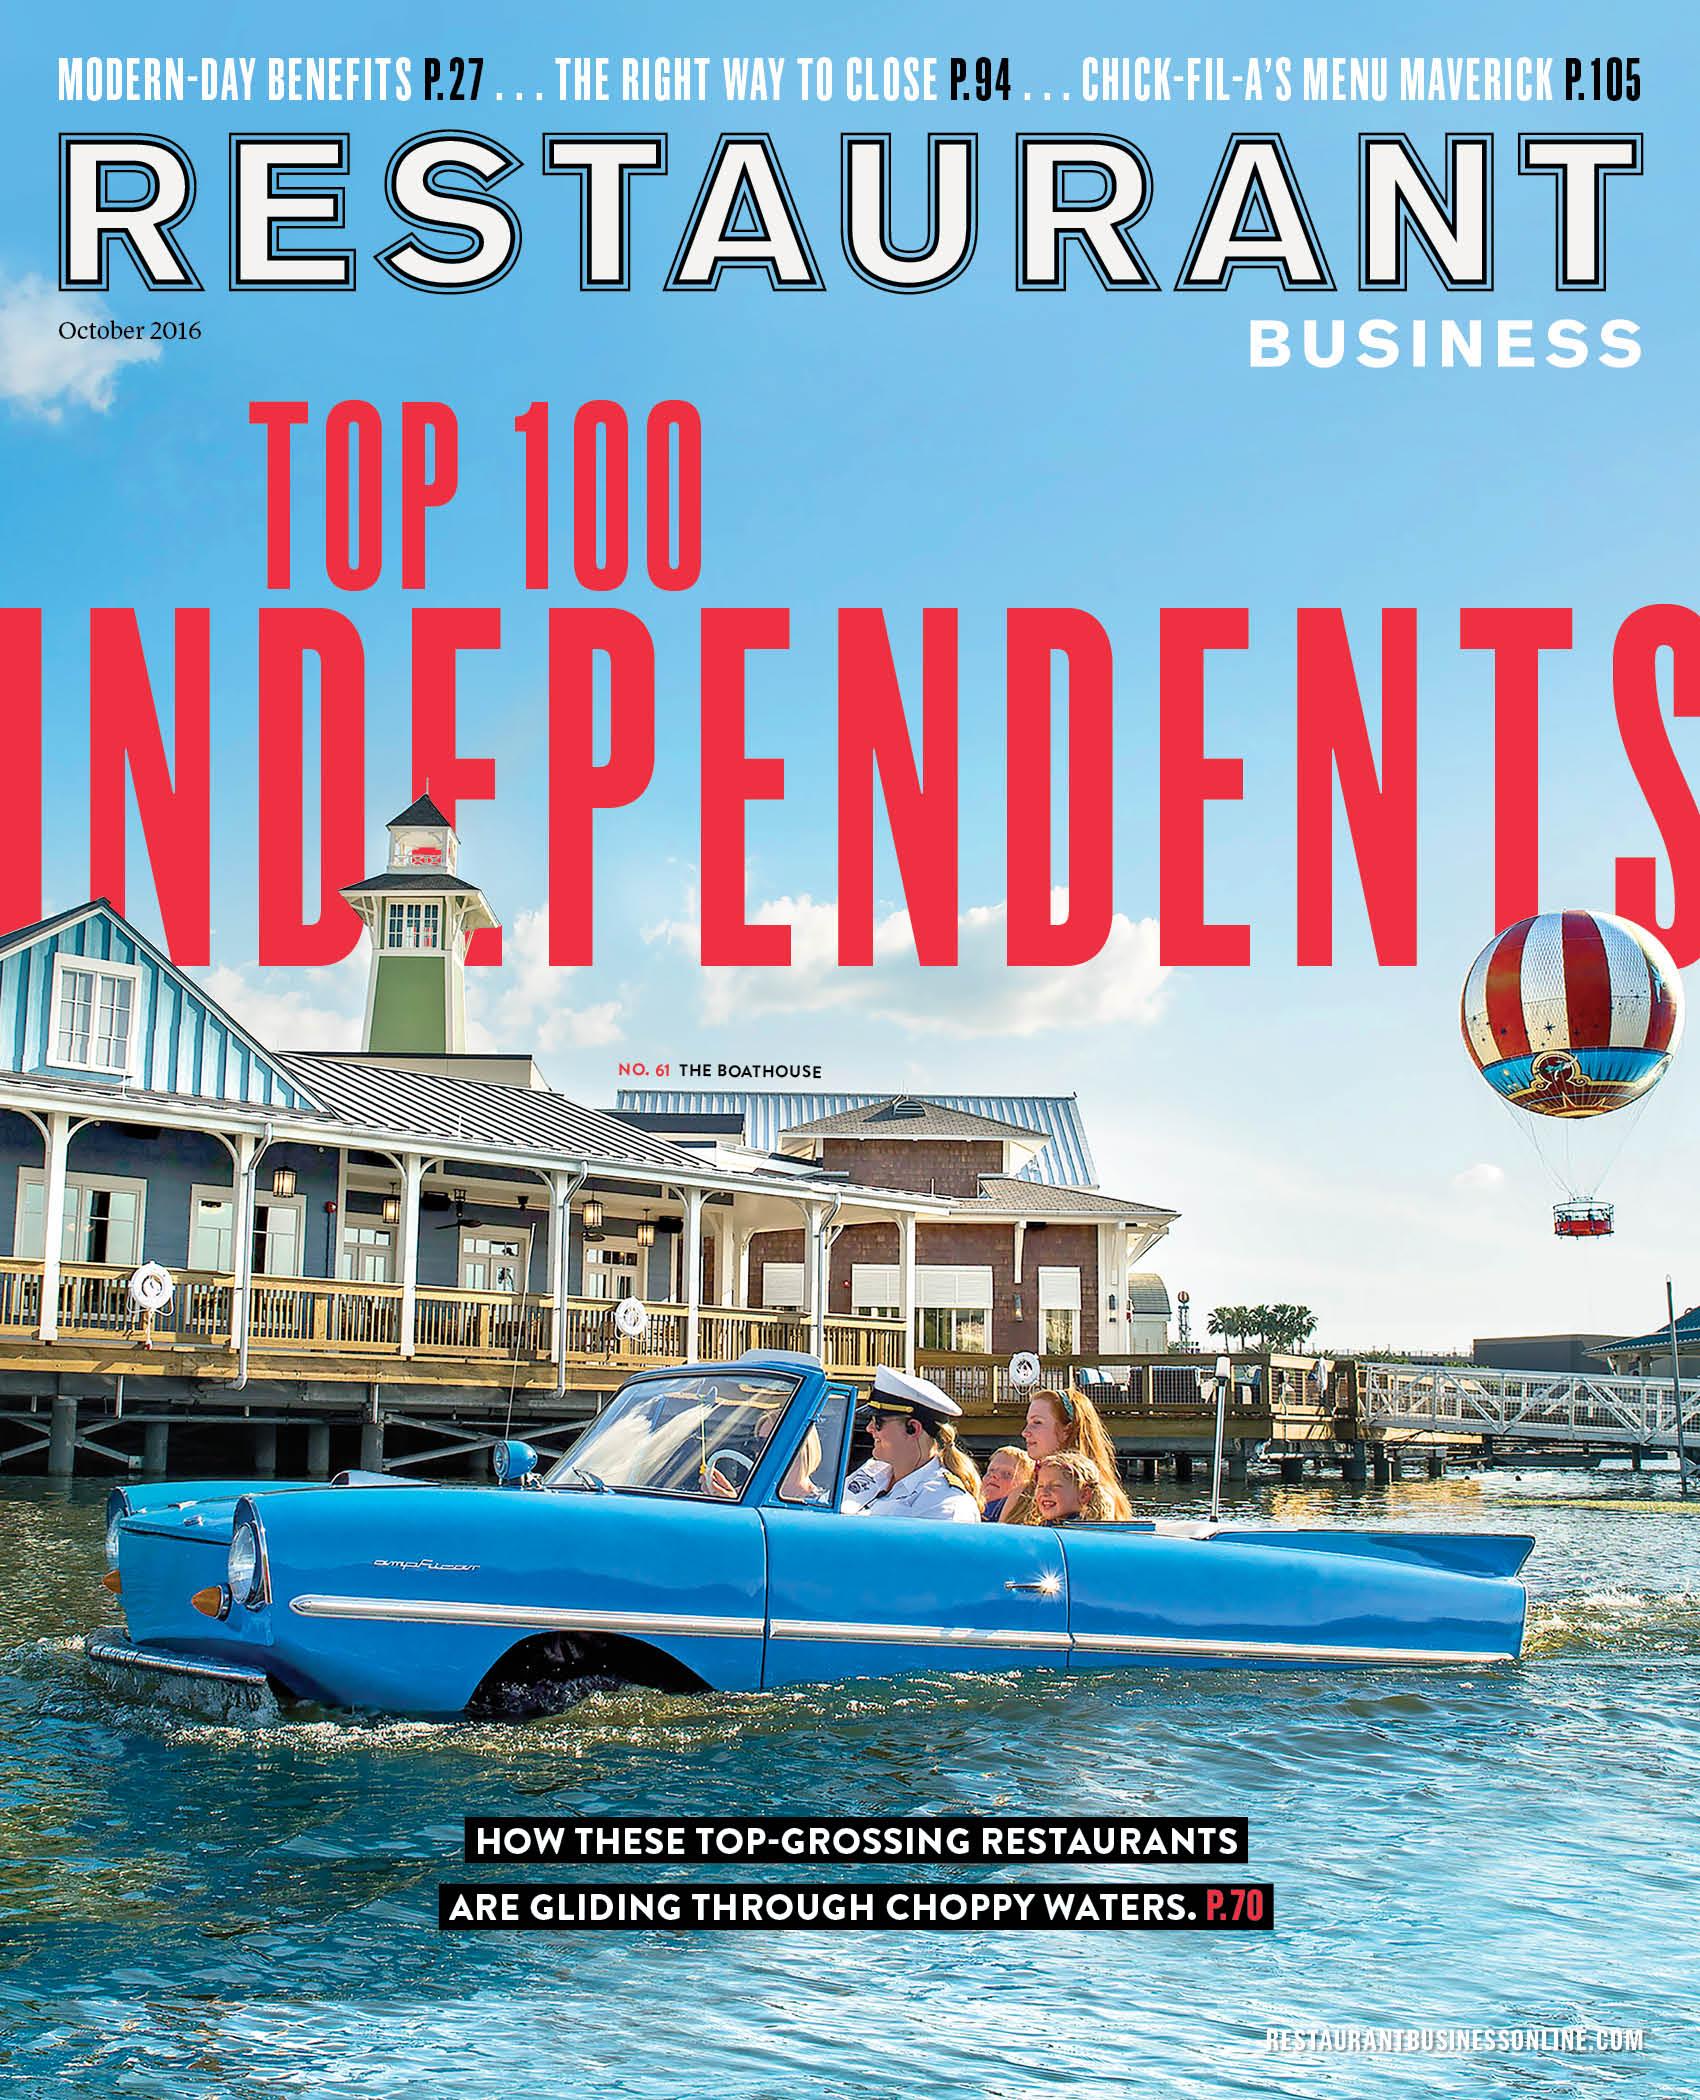 Restaurant Business Magazine October 2016 Issue